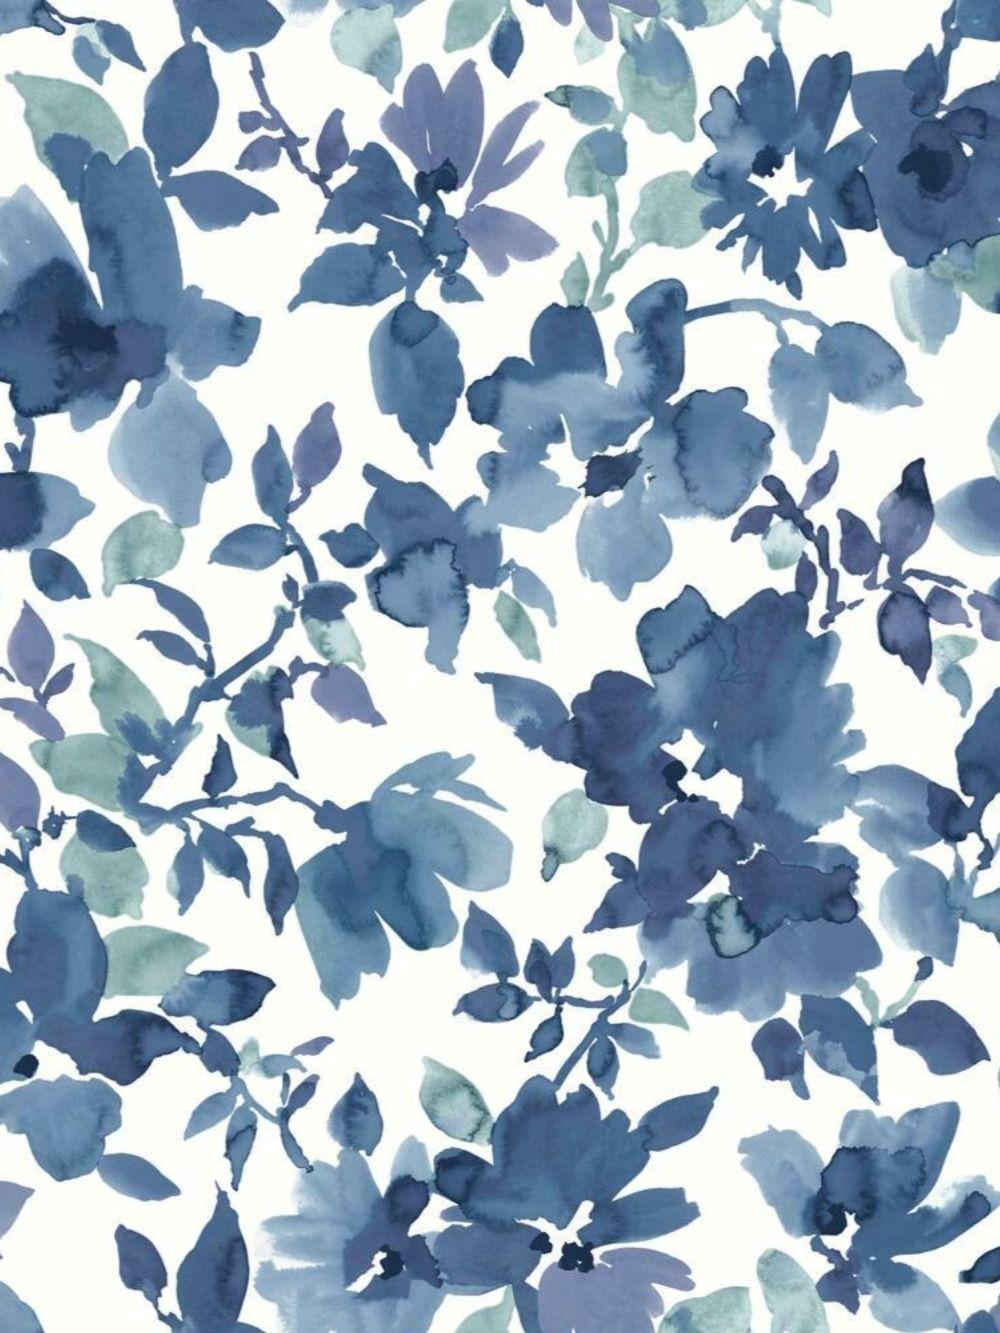 Watercolor Floral Peel And Stick Wallpaper Wallpaper Background Design Spring Wallpaper Peel And Stick Wallpaper